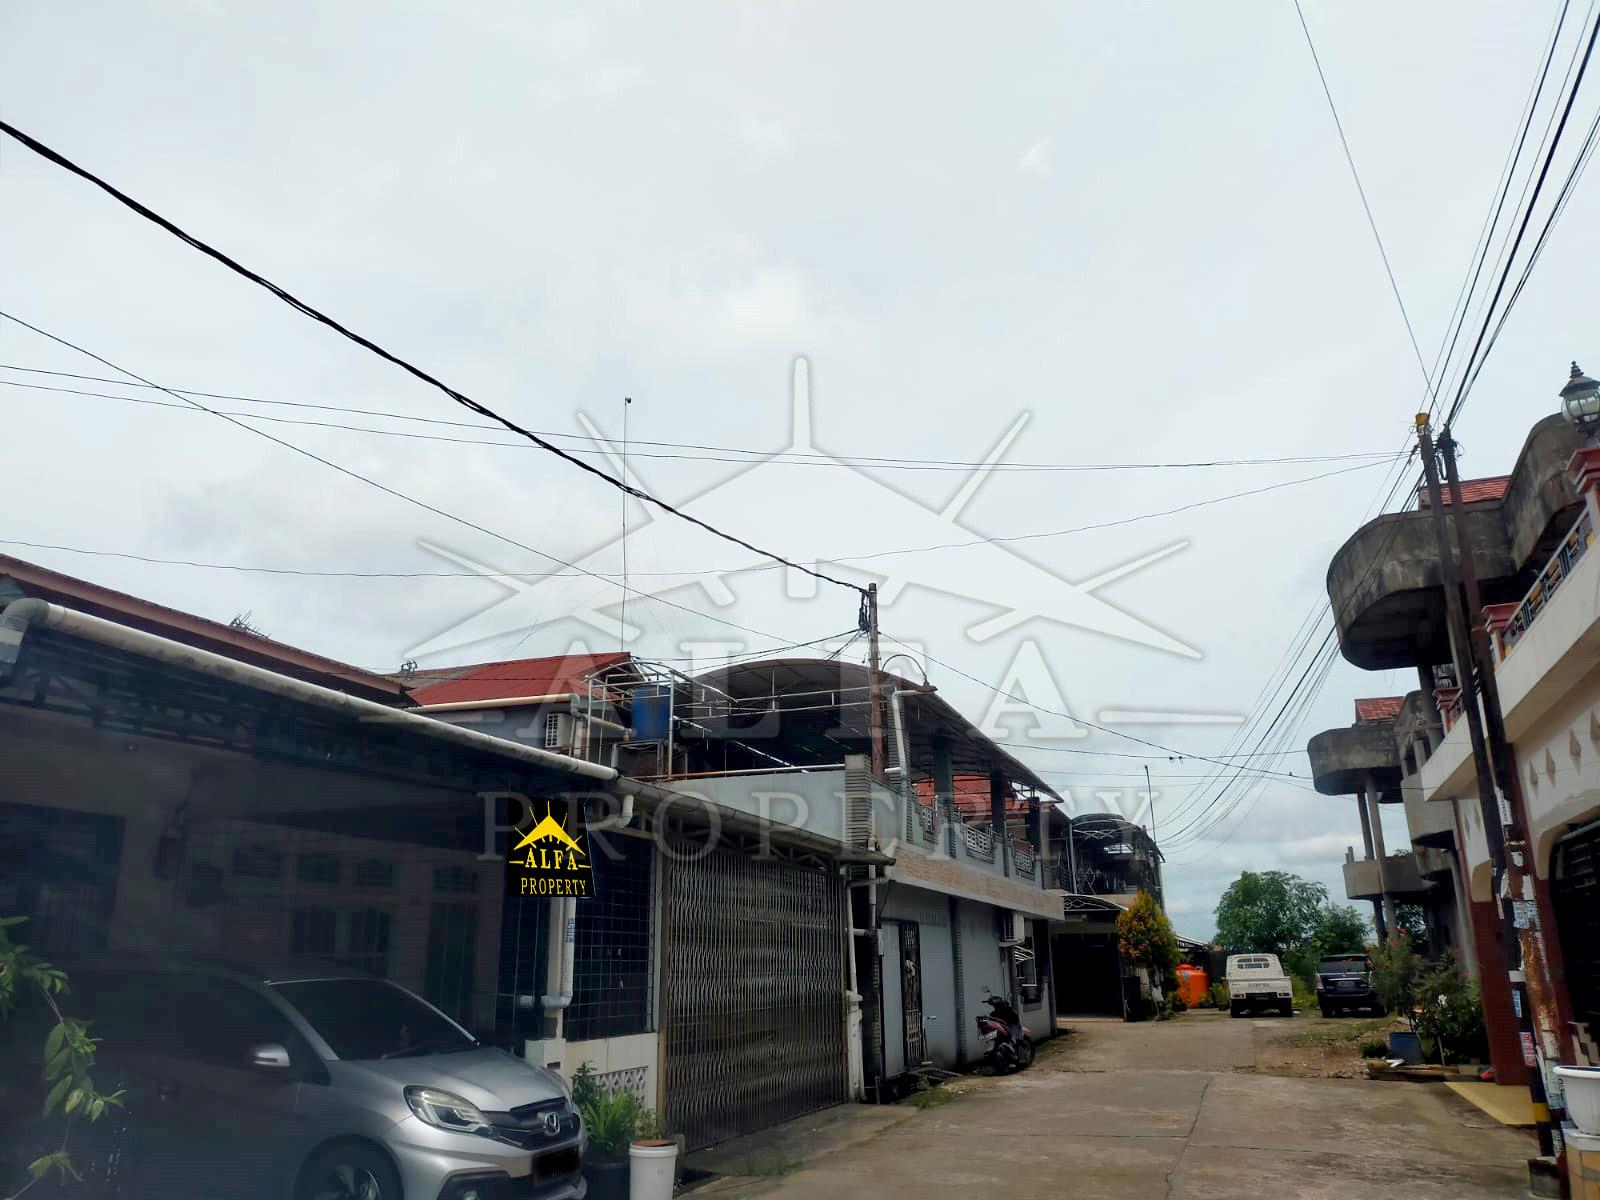 Rumah Komp. Nusa Indah, Pontianak, Kalimantan Barat - 5